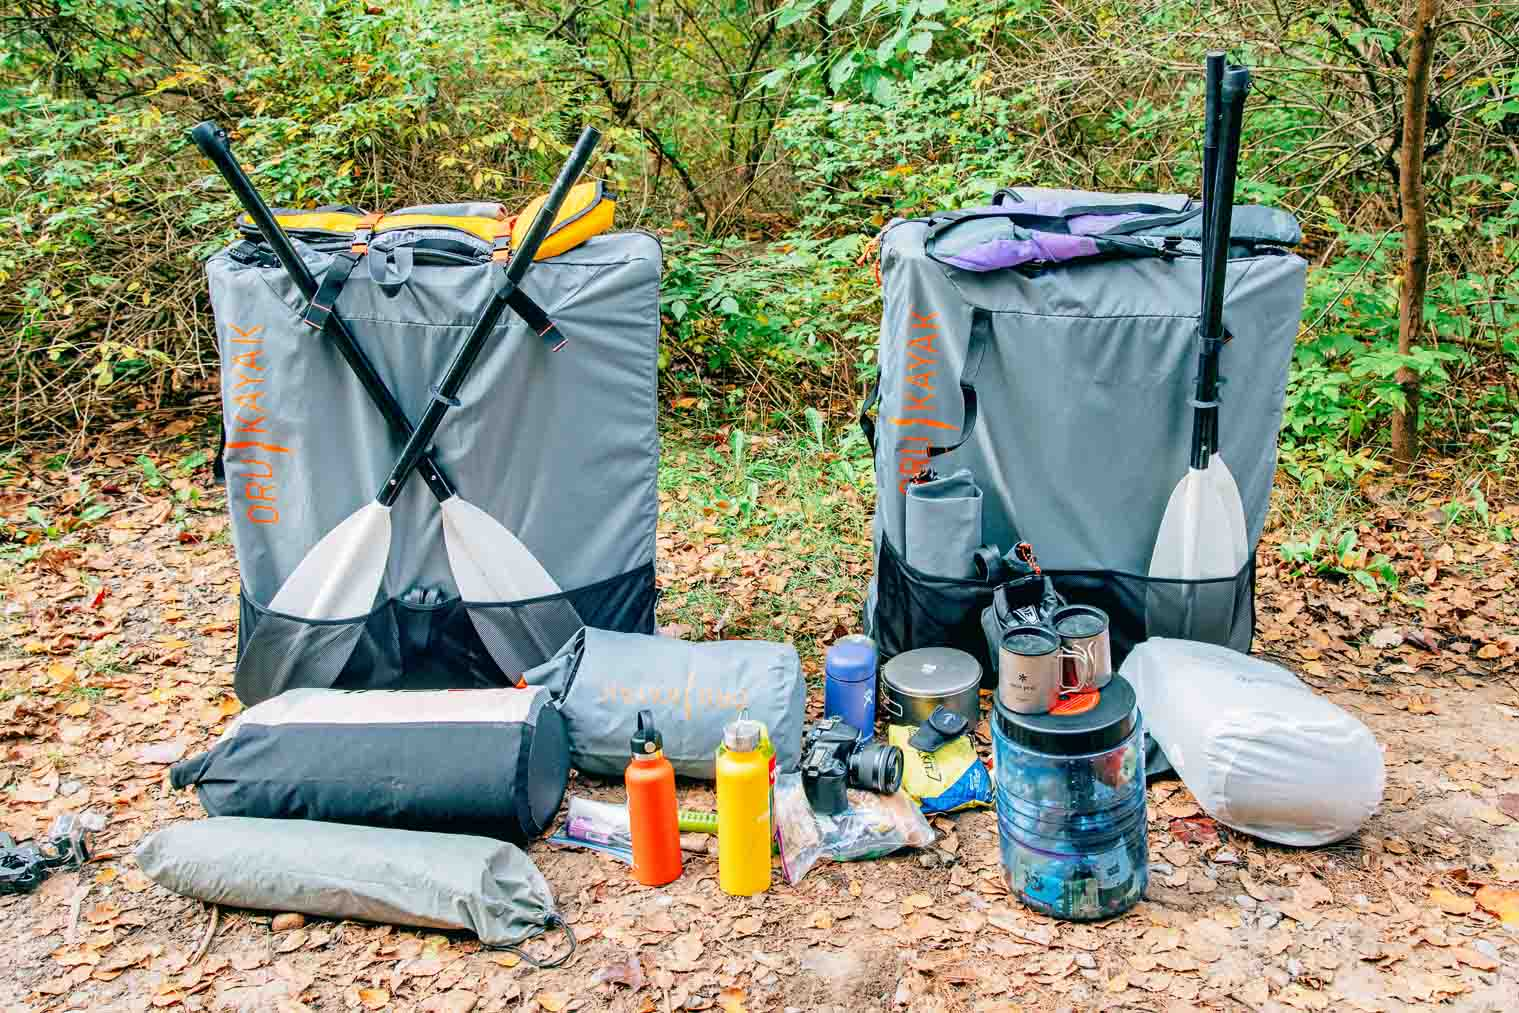 Overnight kayak camping gear